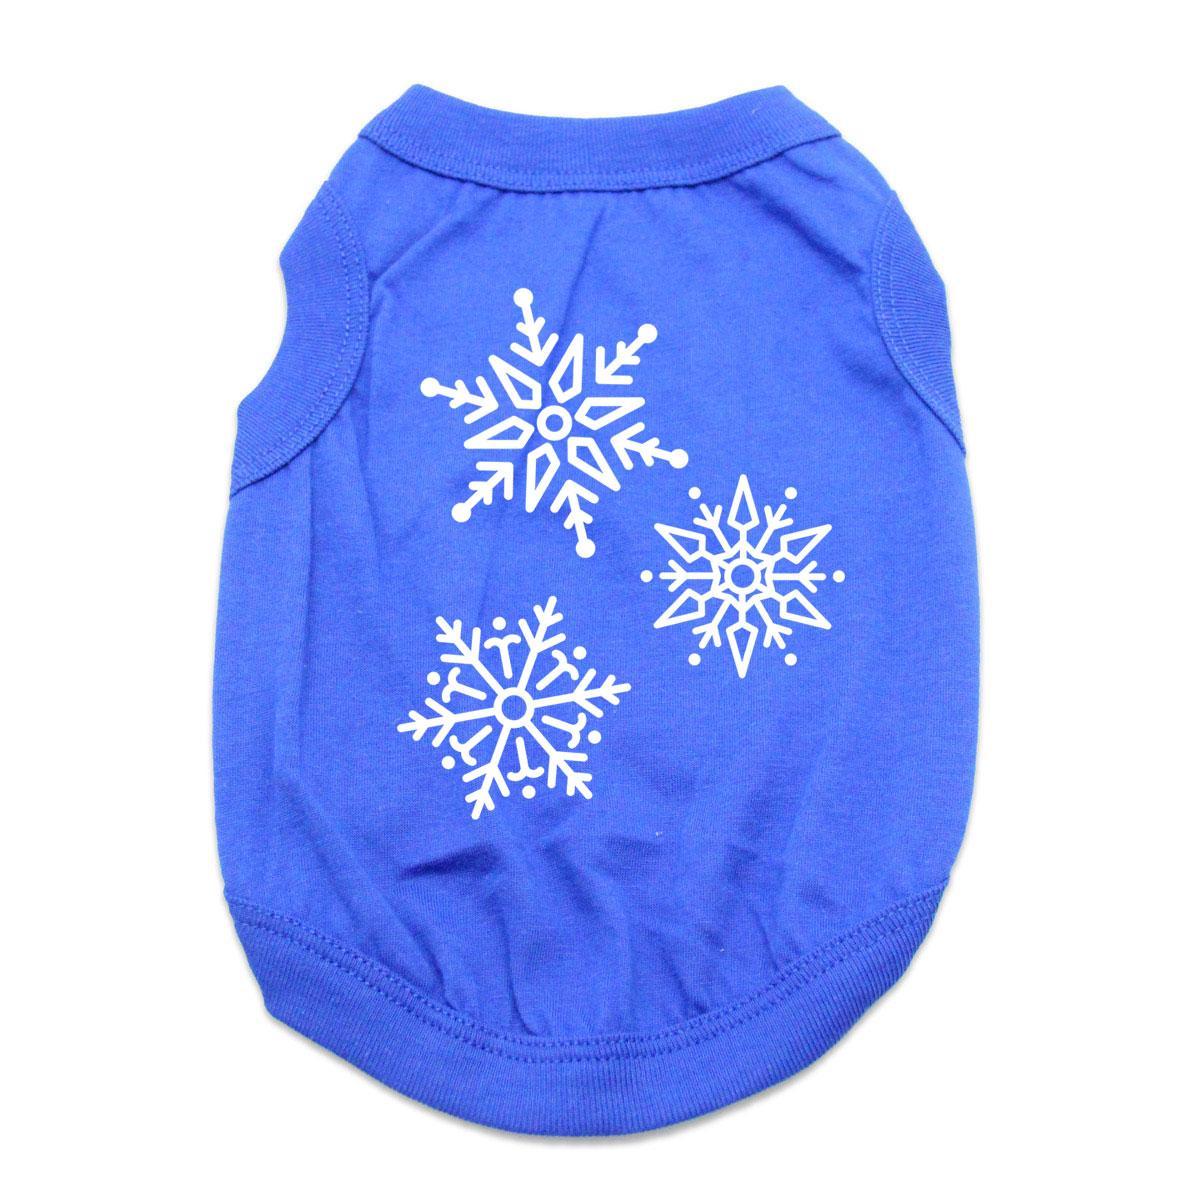 Snowflakes Dog Shirt - Blue